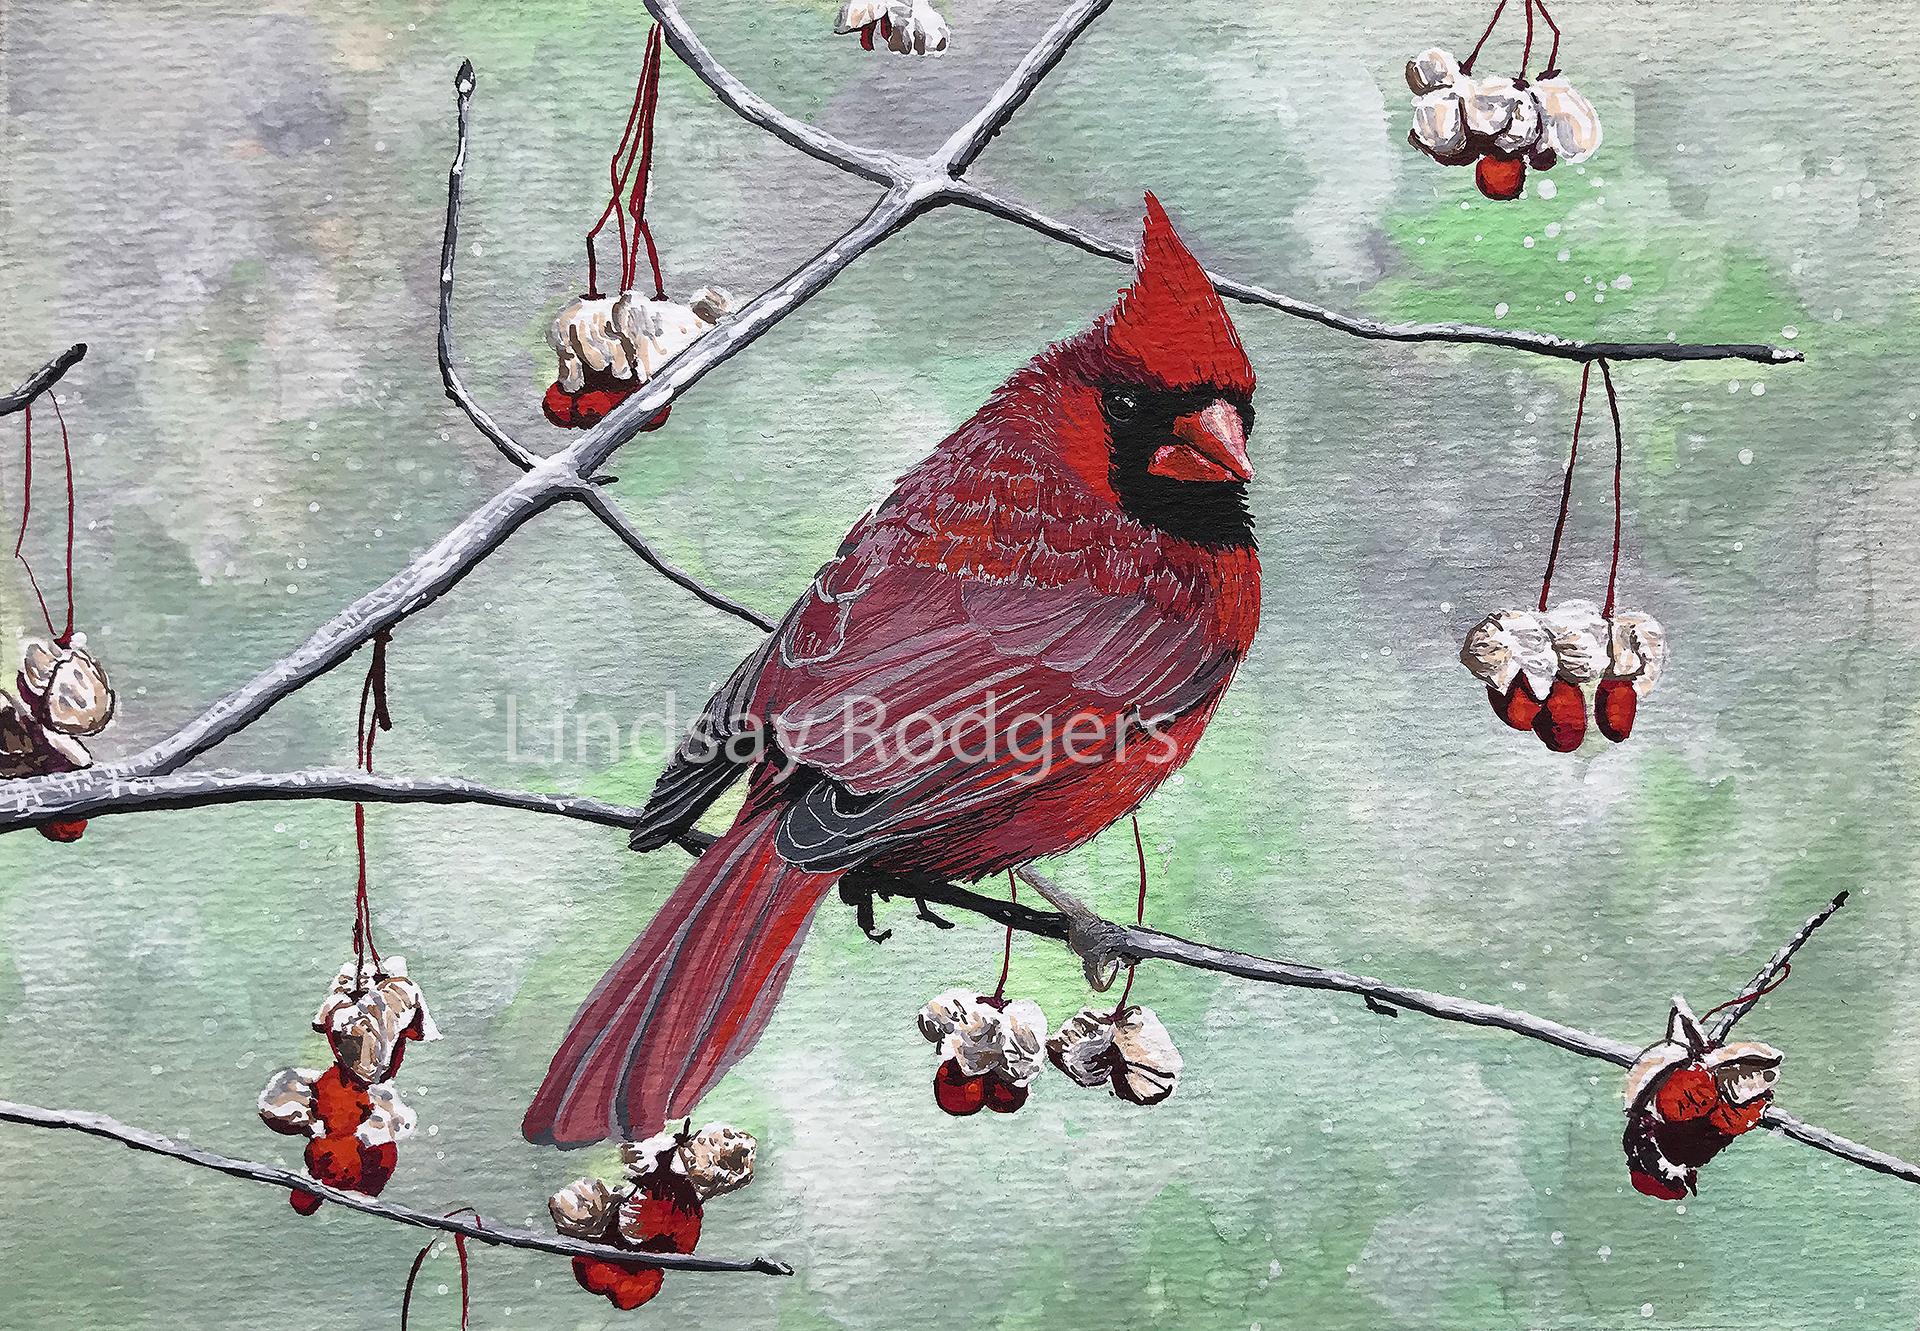 cardinalscene etsy.jpg